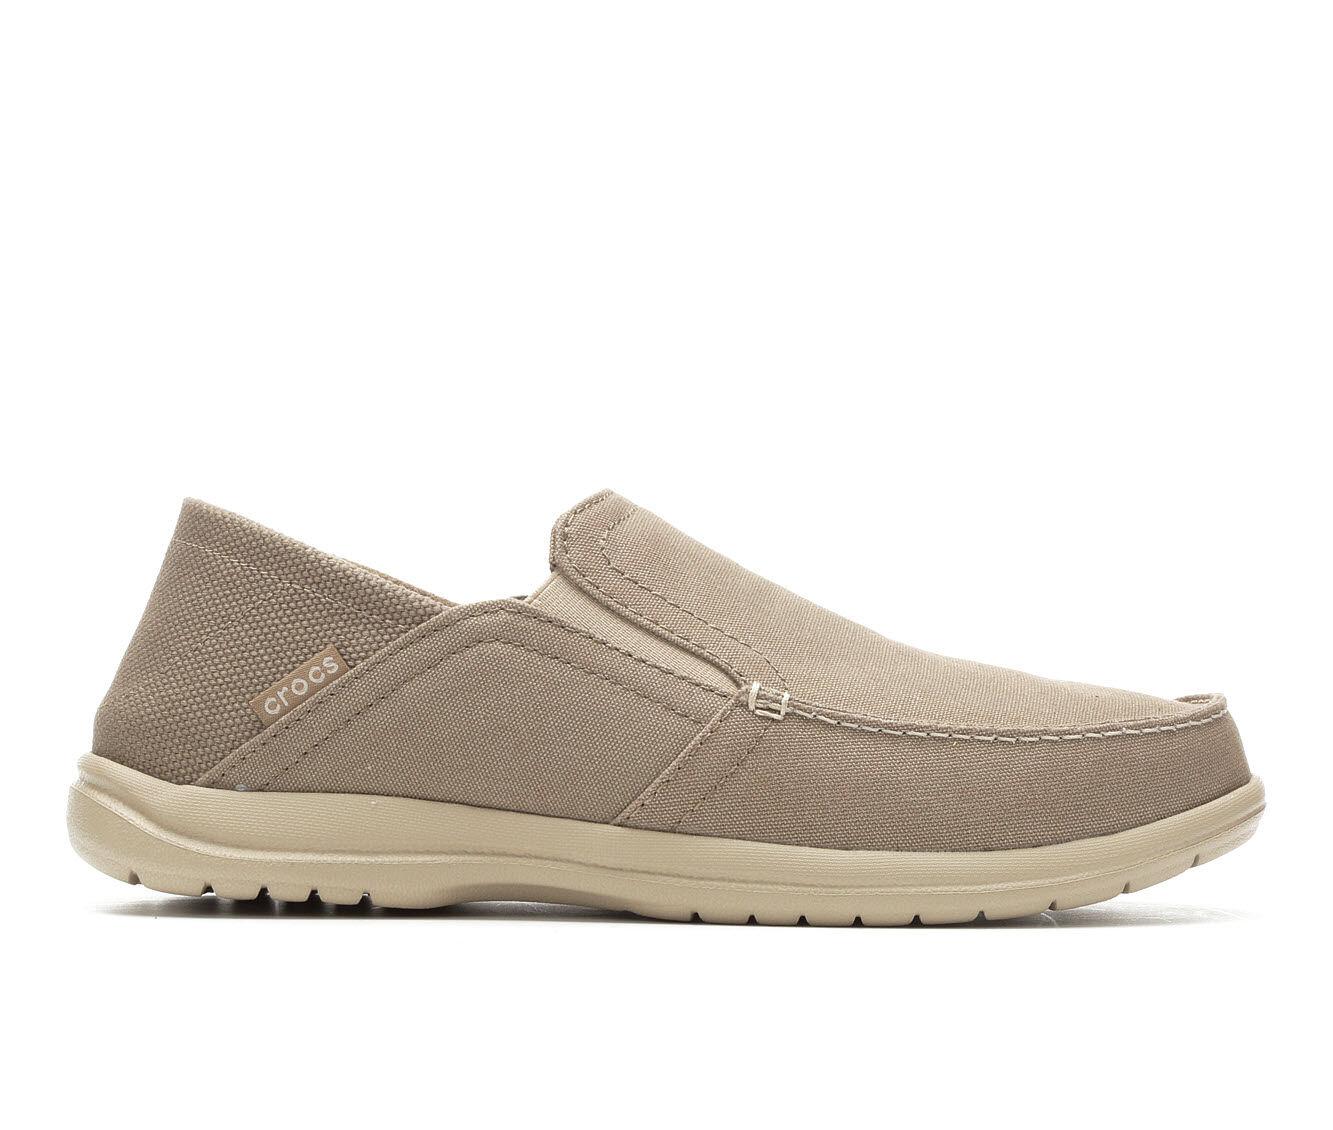 Men's Crocs Santa Cruz Convertible Slip On Loafer Khaki/Cobble